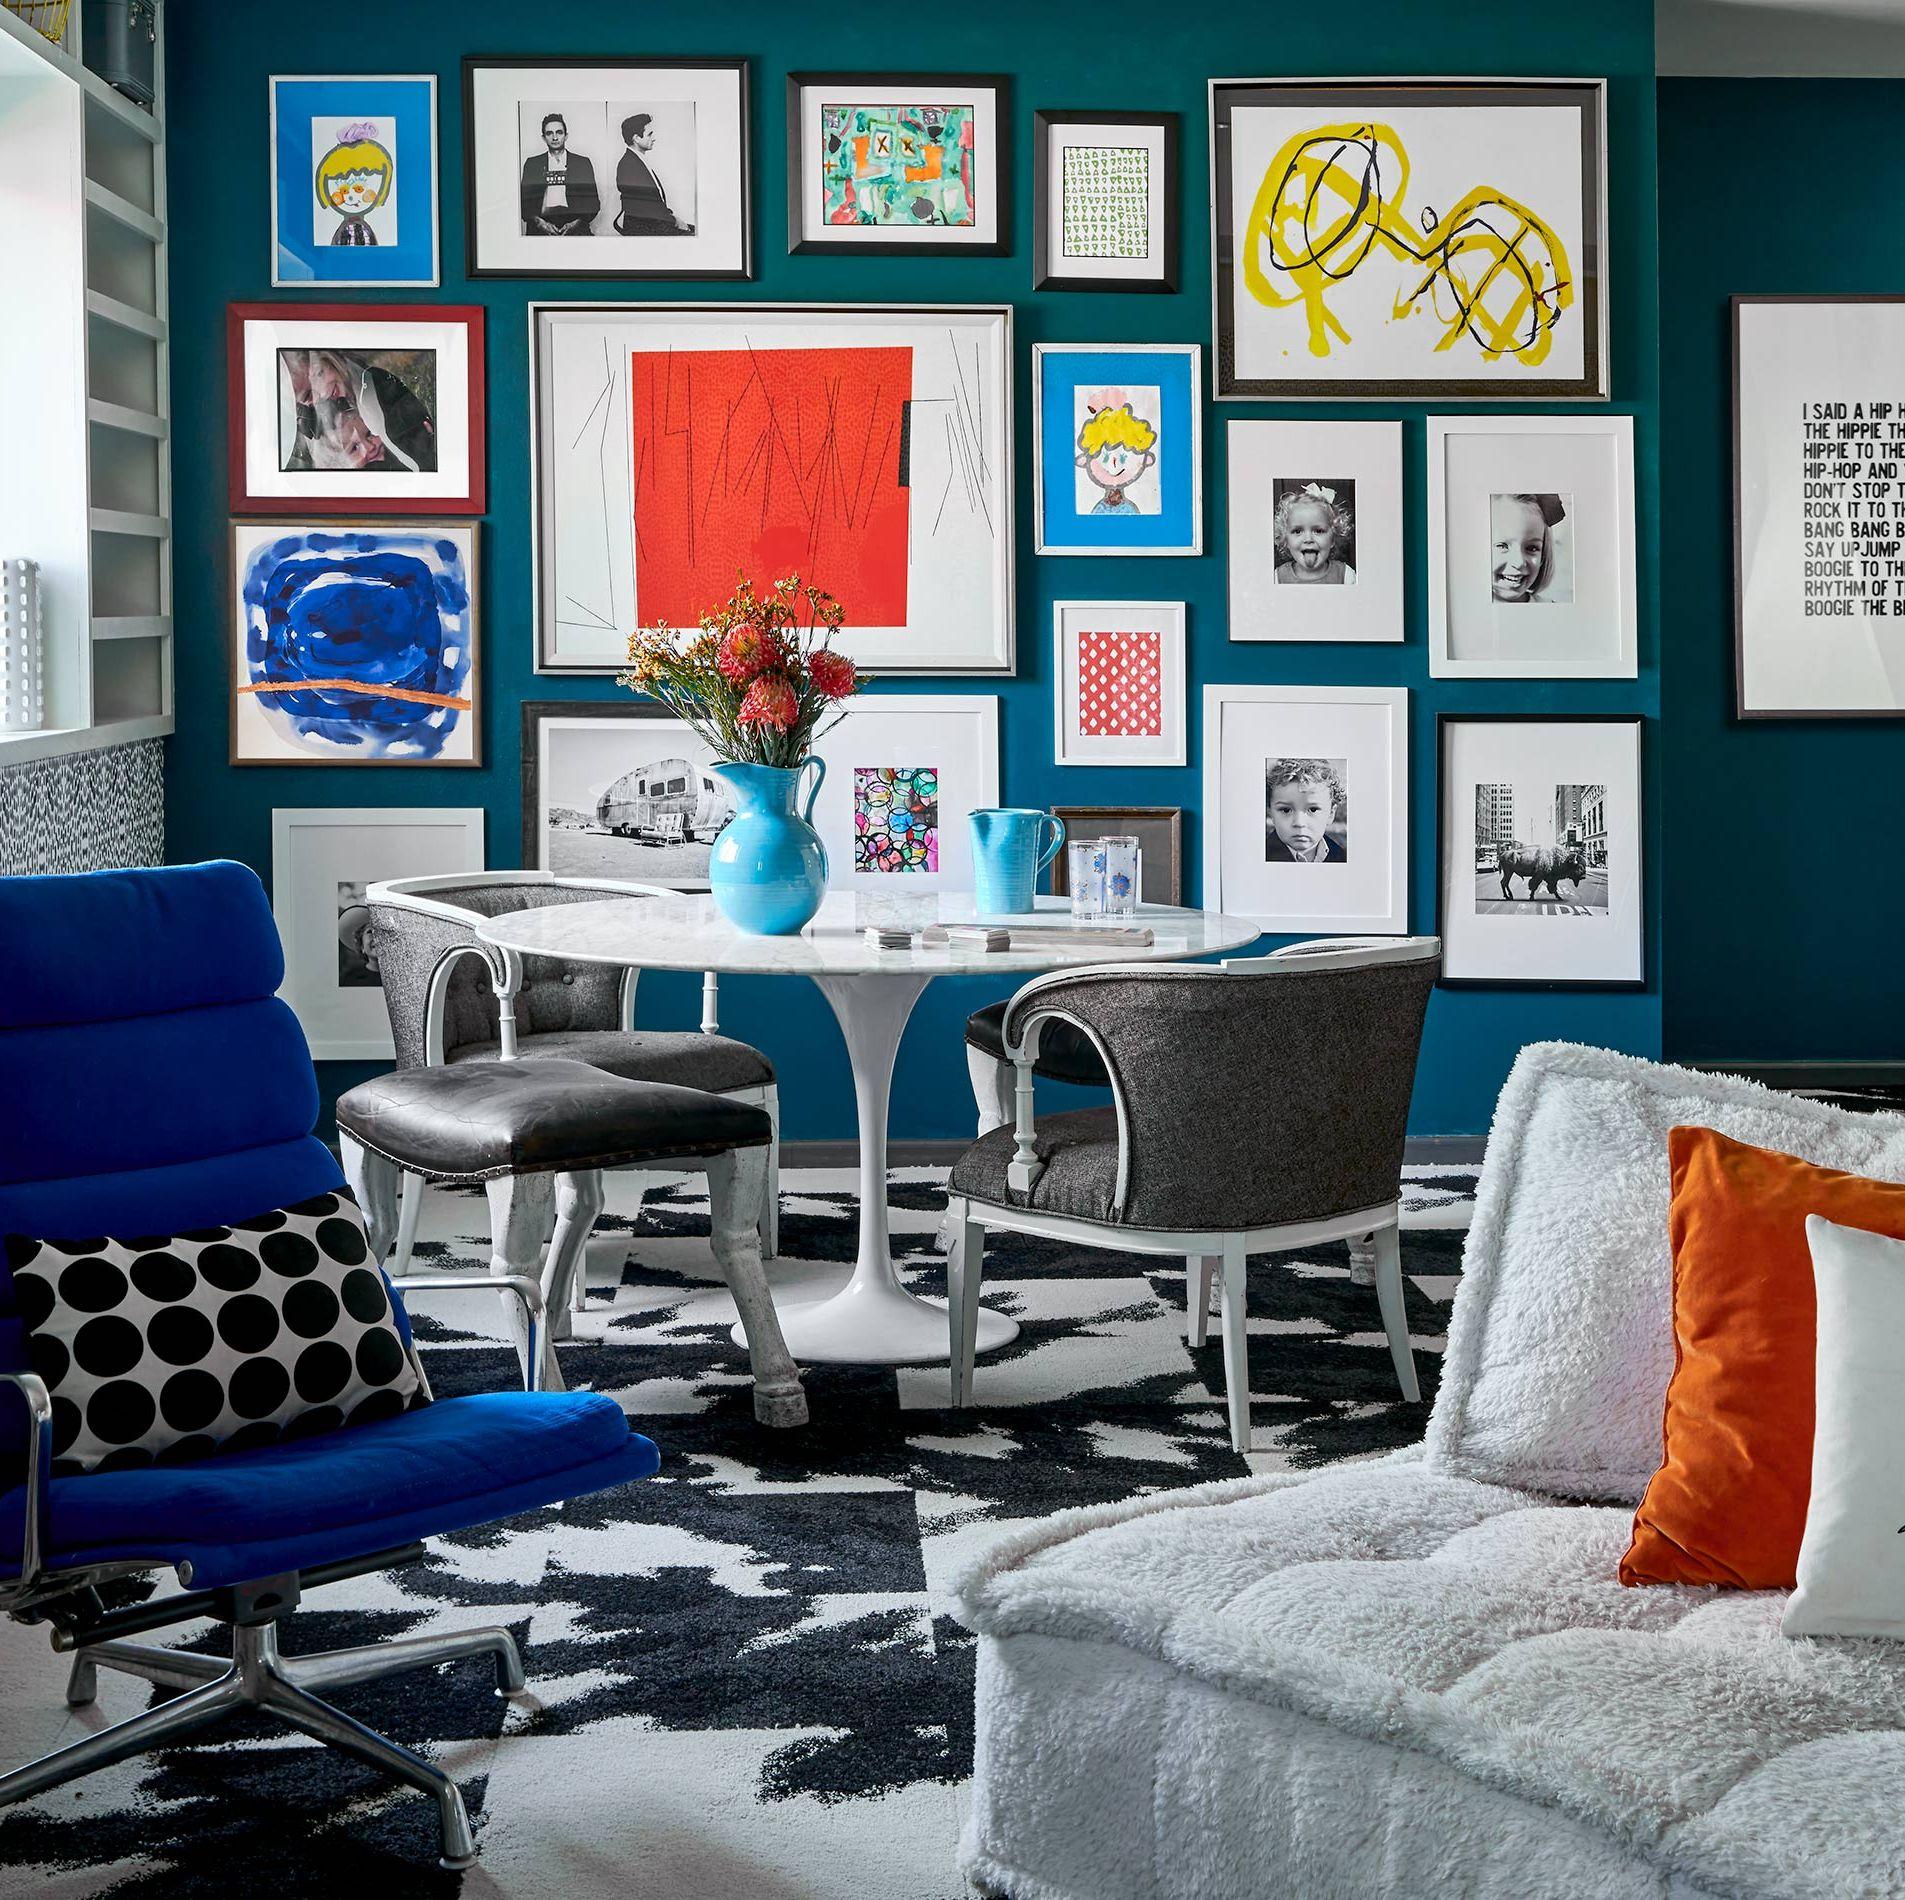 How a Designer Made a Colorado Mountain Home Feel Fresh for Her Busy Family